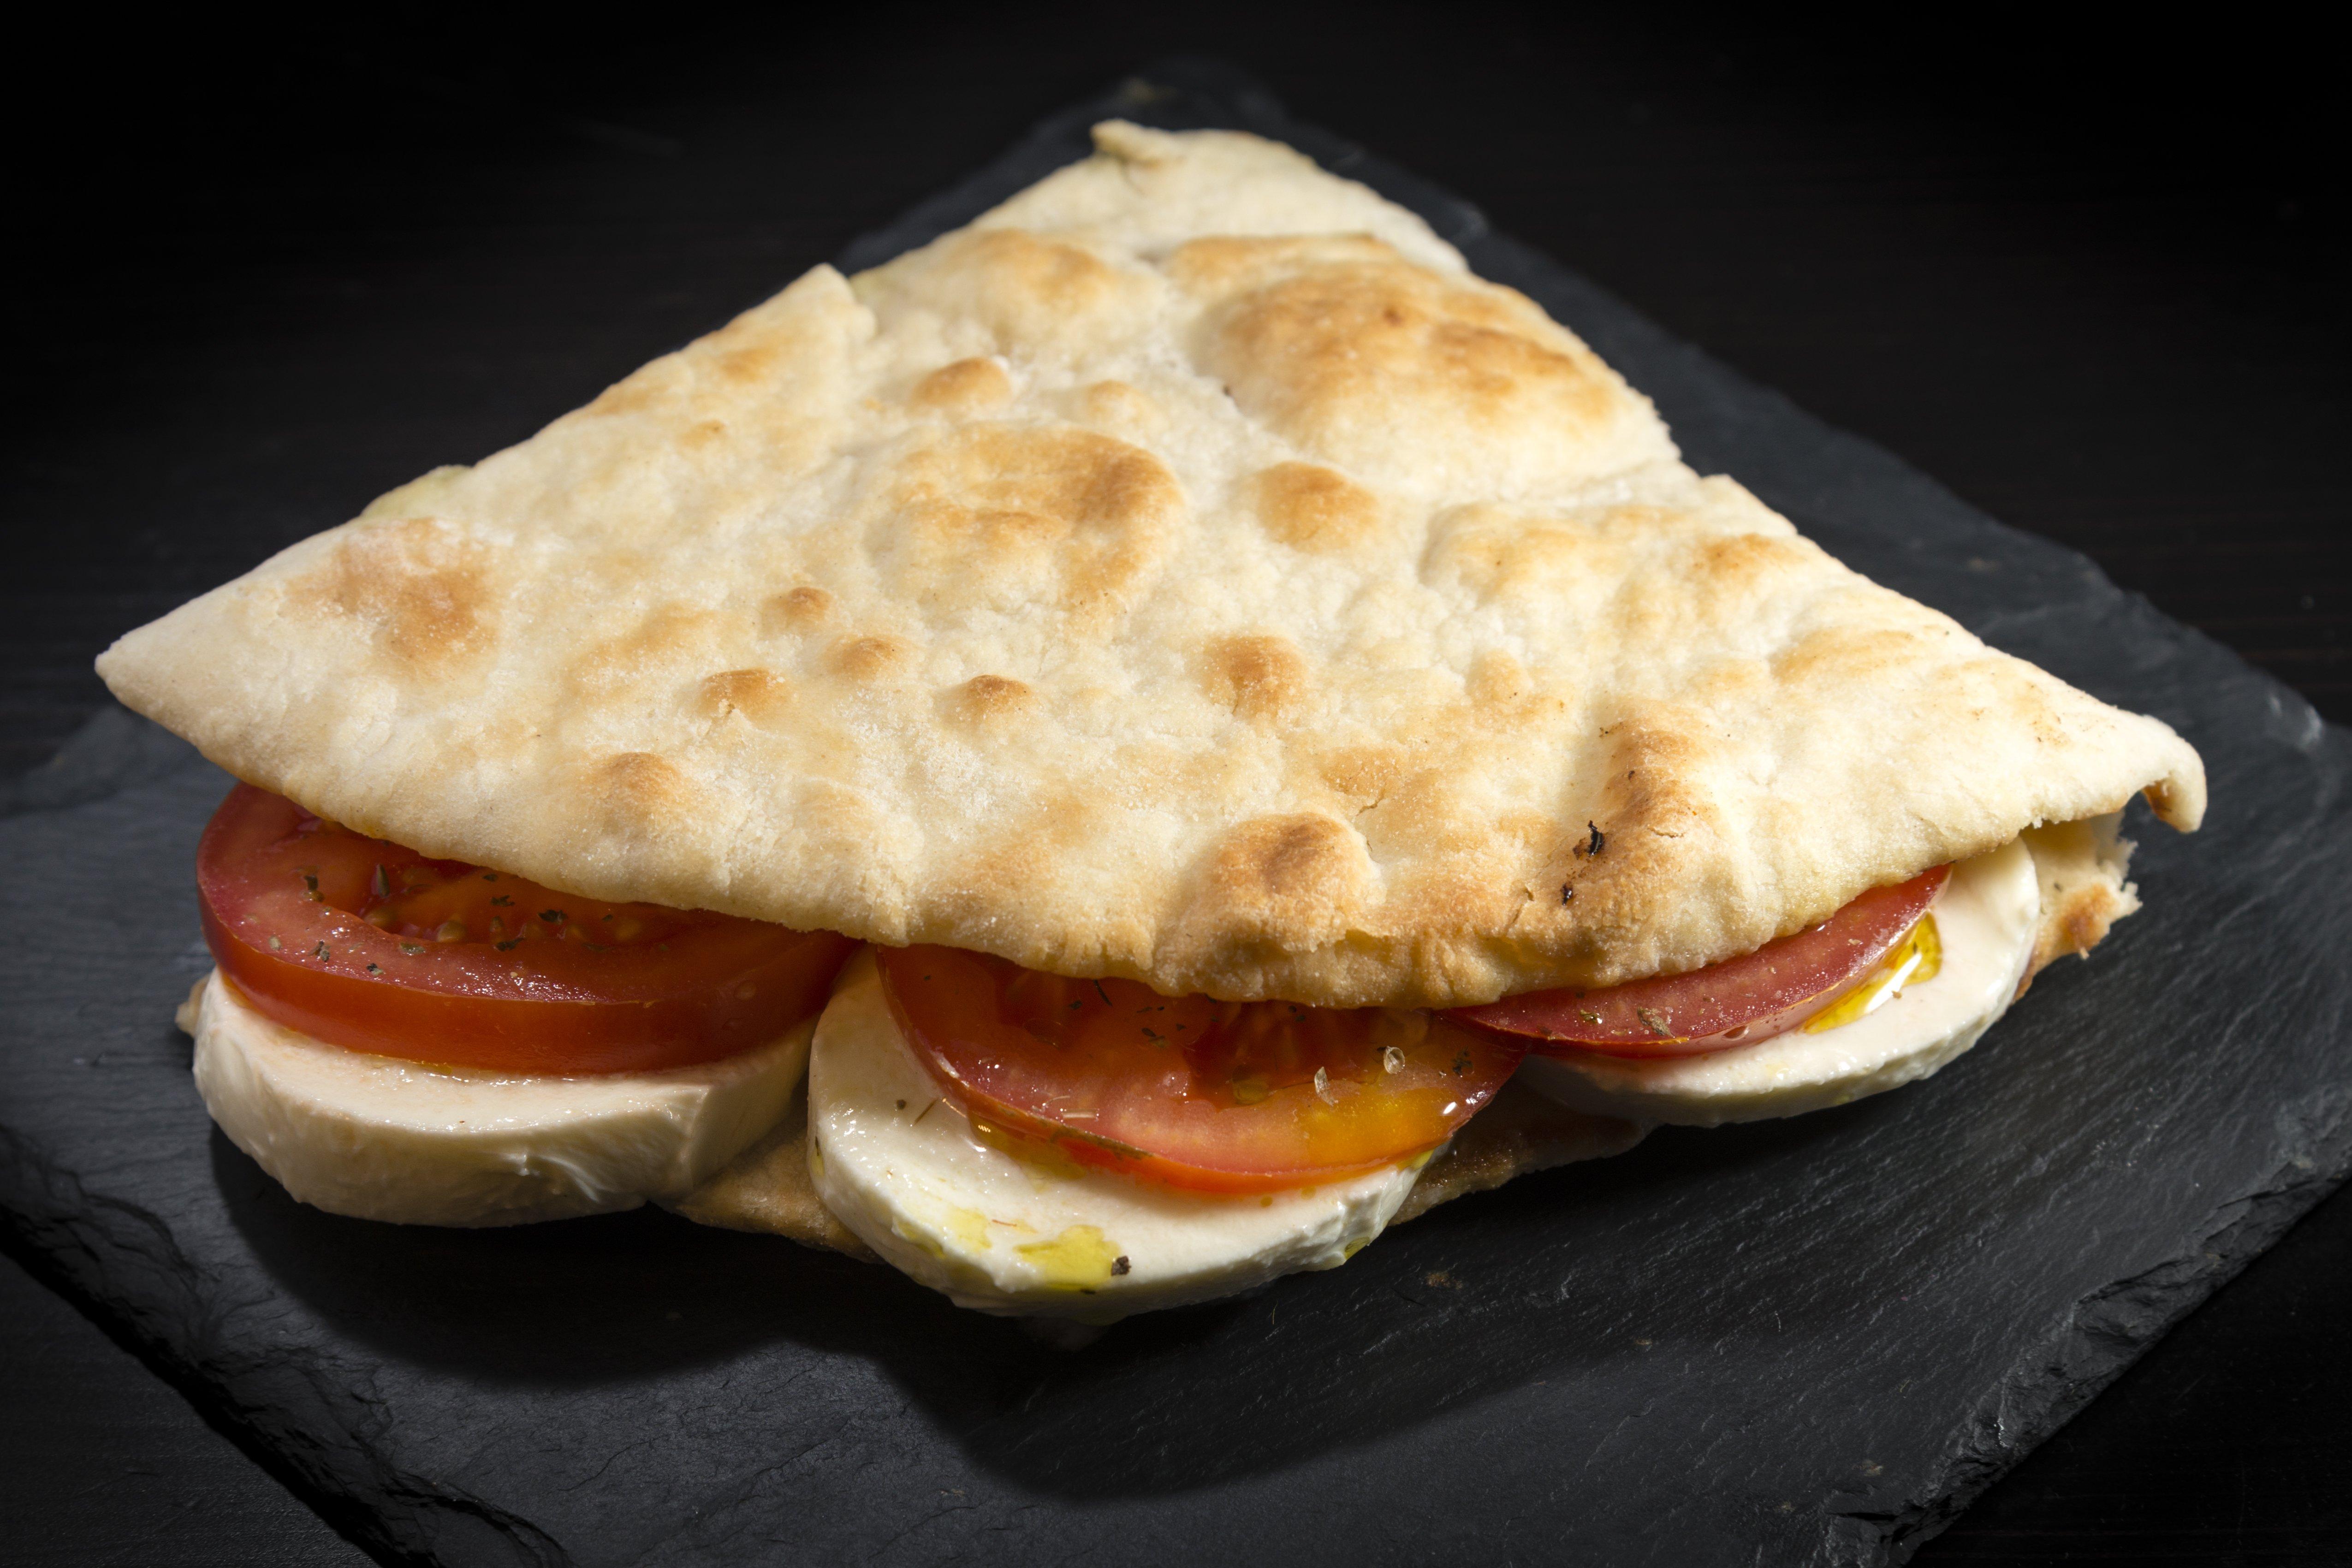 Focaccia con mozzarella e pomodoro fresco